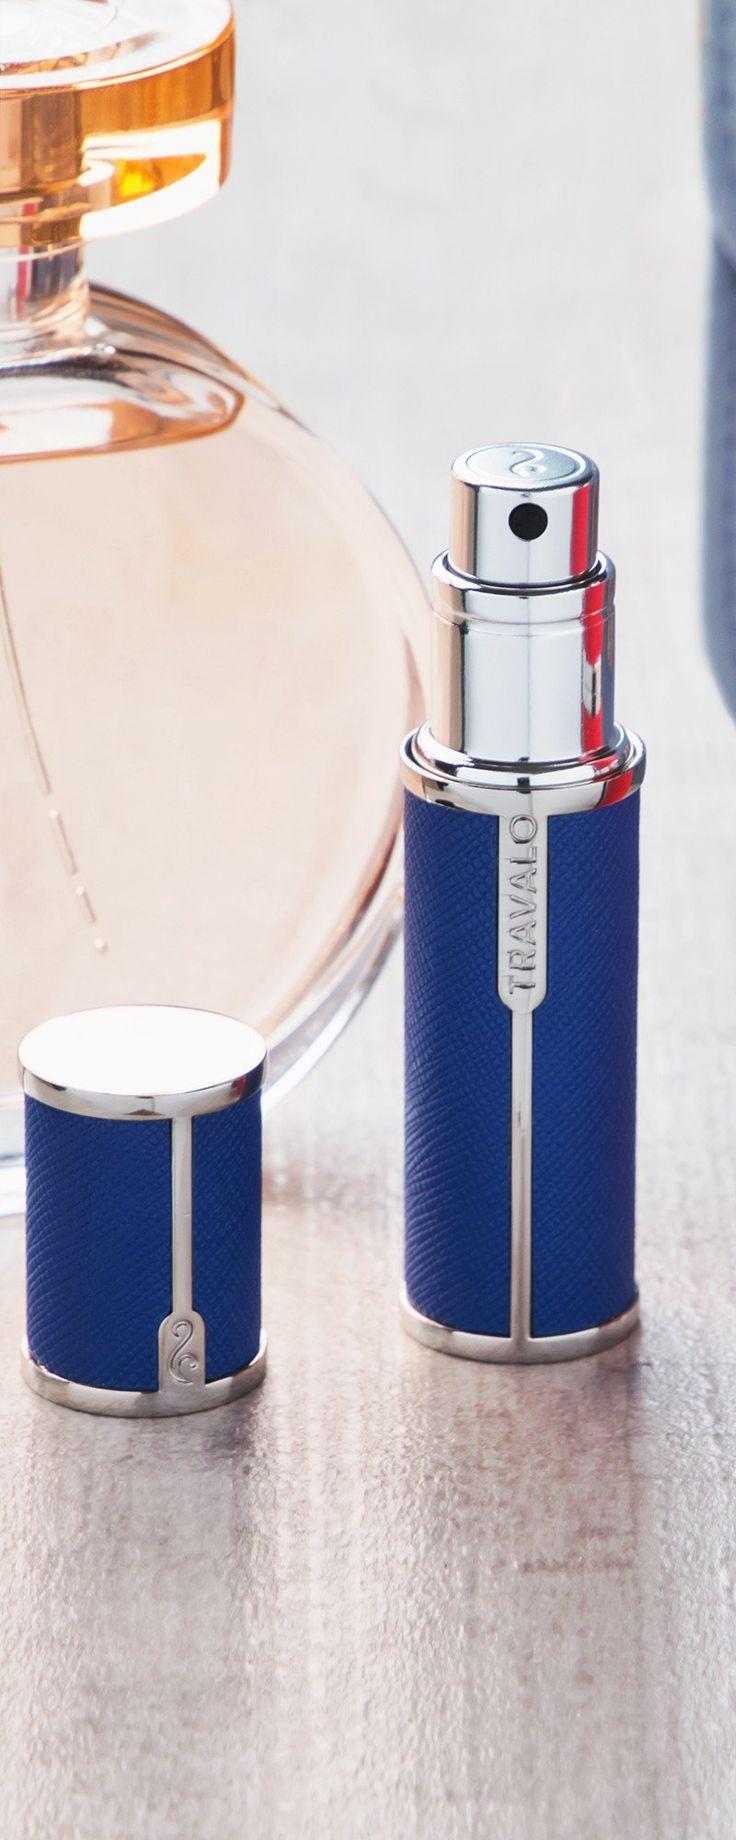 Pocket-sized, refillable travel perfume atomizer spray bottle via TheGrommet.com